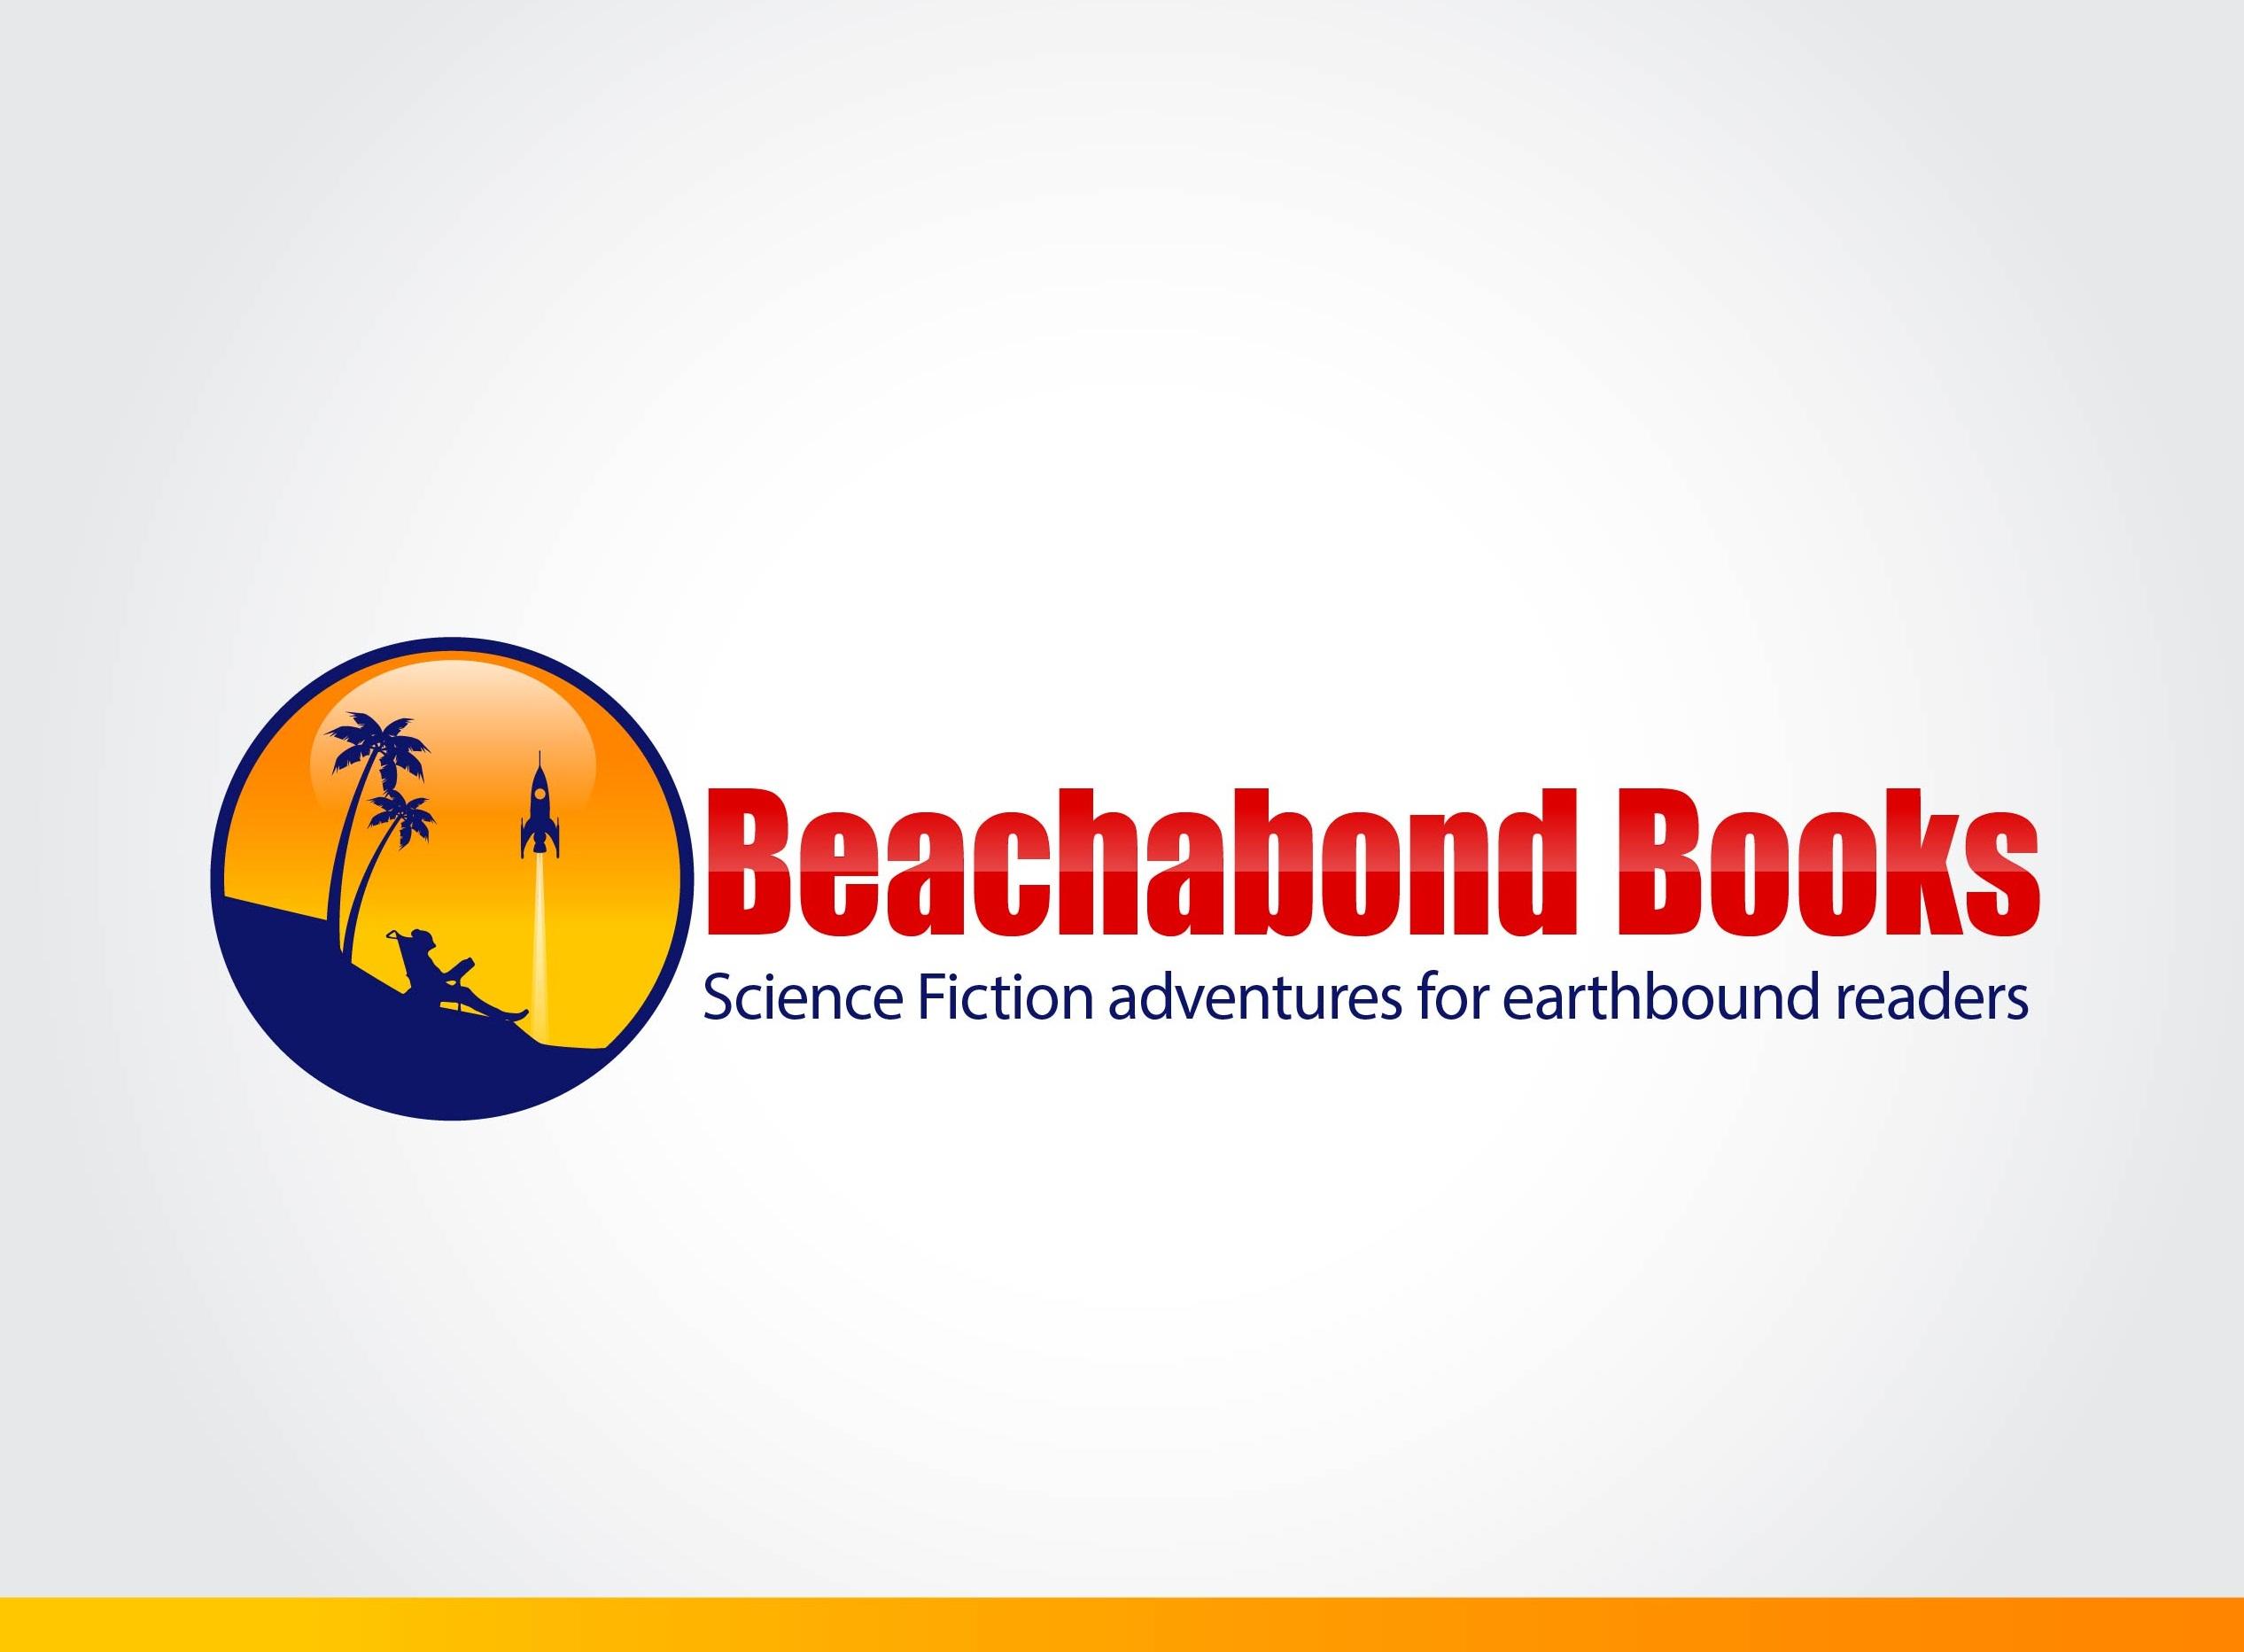 Beachabond-Books